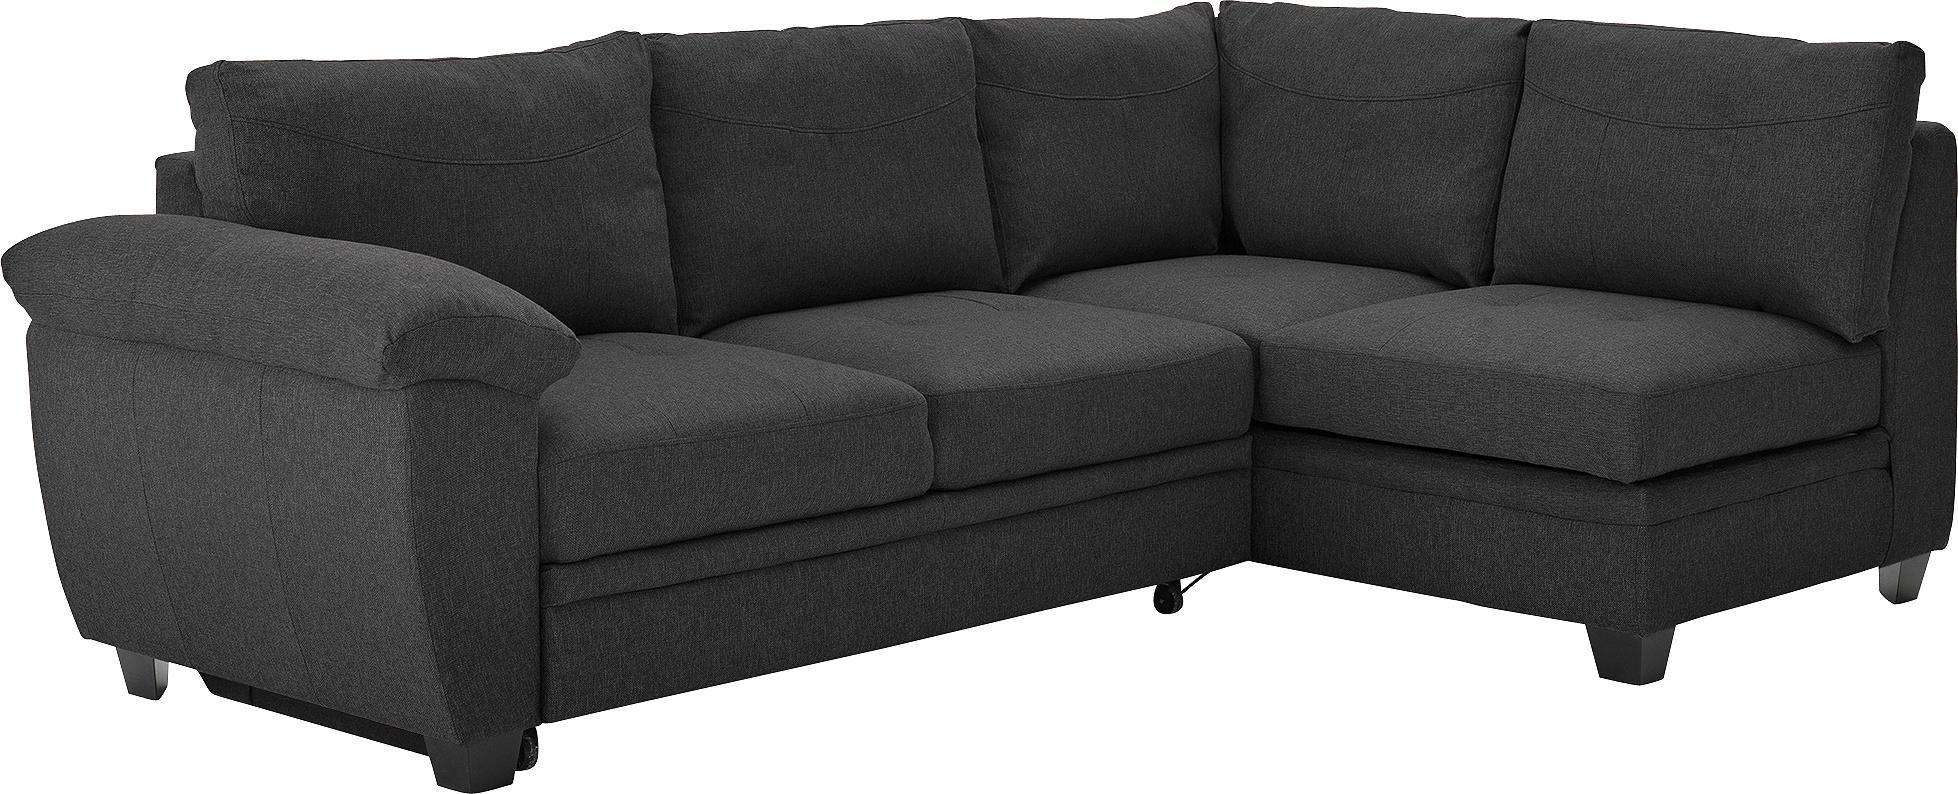 Argos Home - Fernando Fabric Right Corner - Sofa Bed - Charcoal